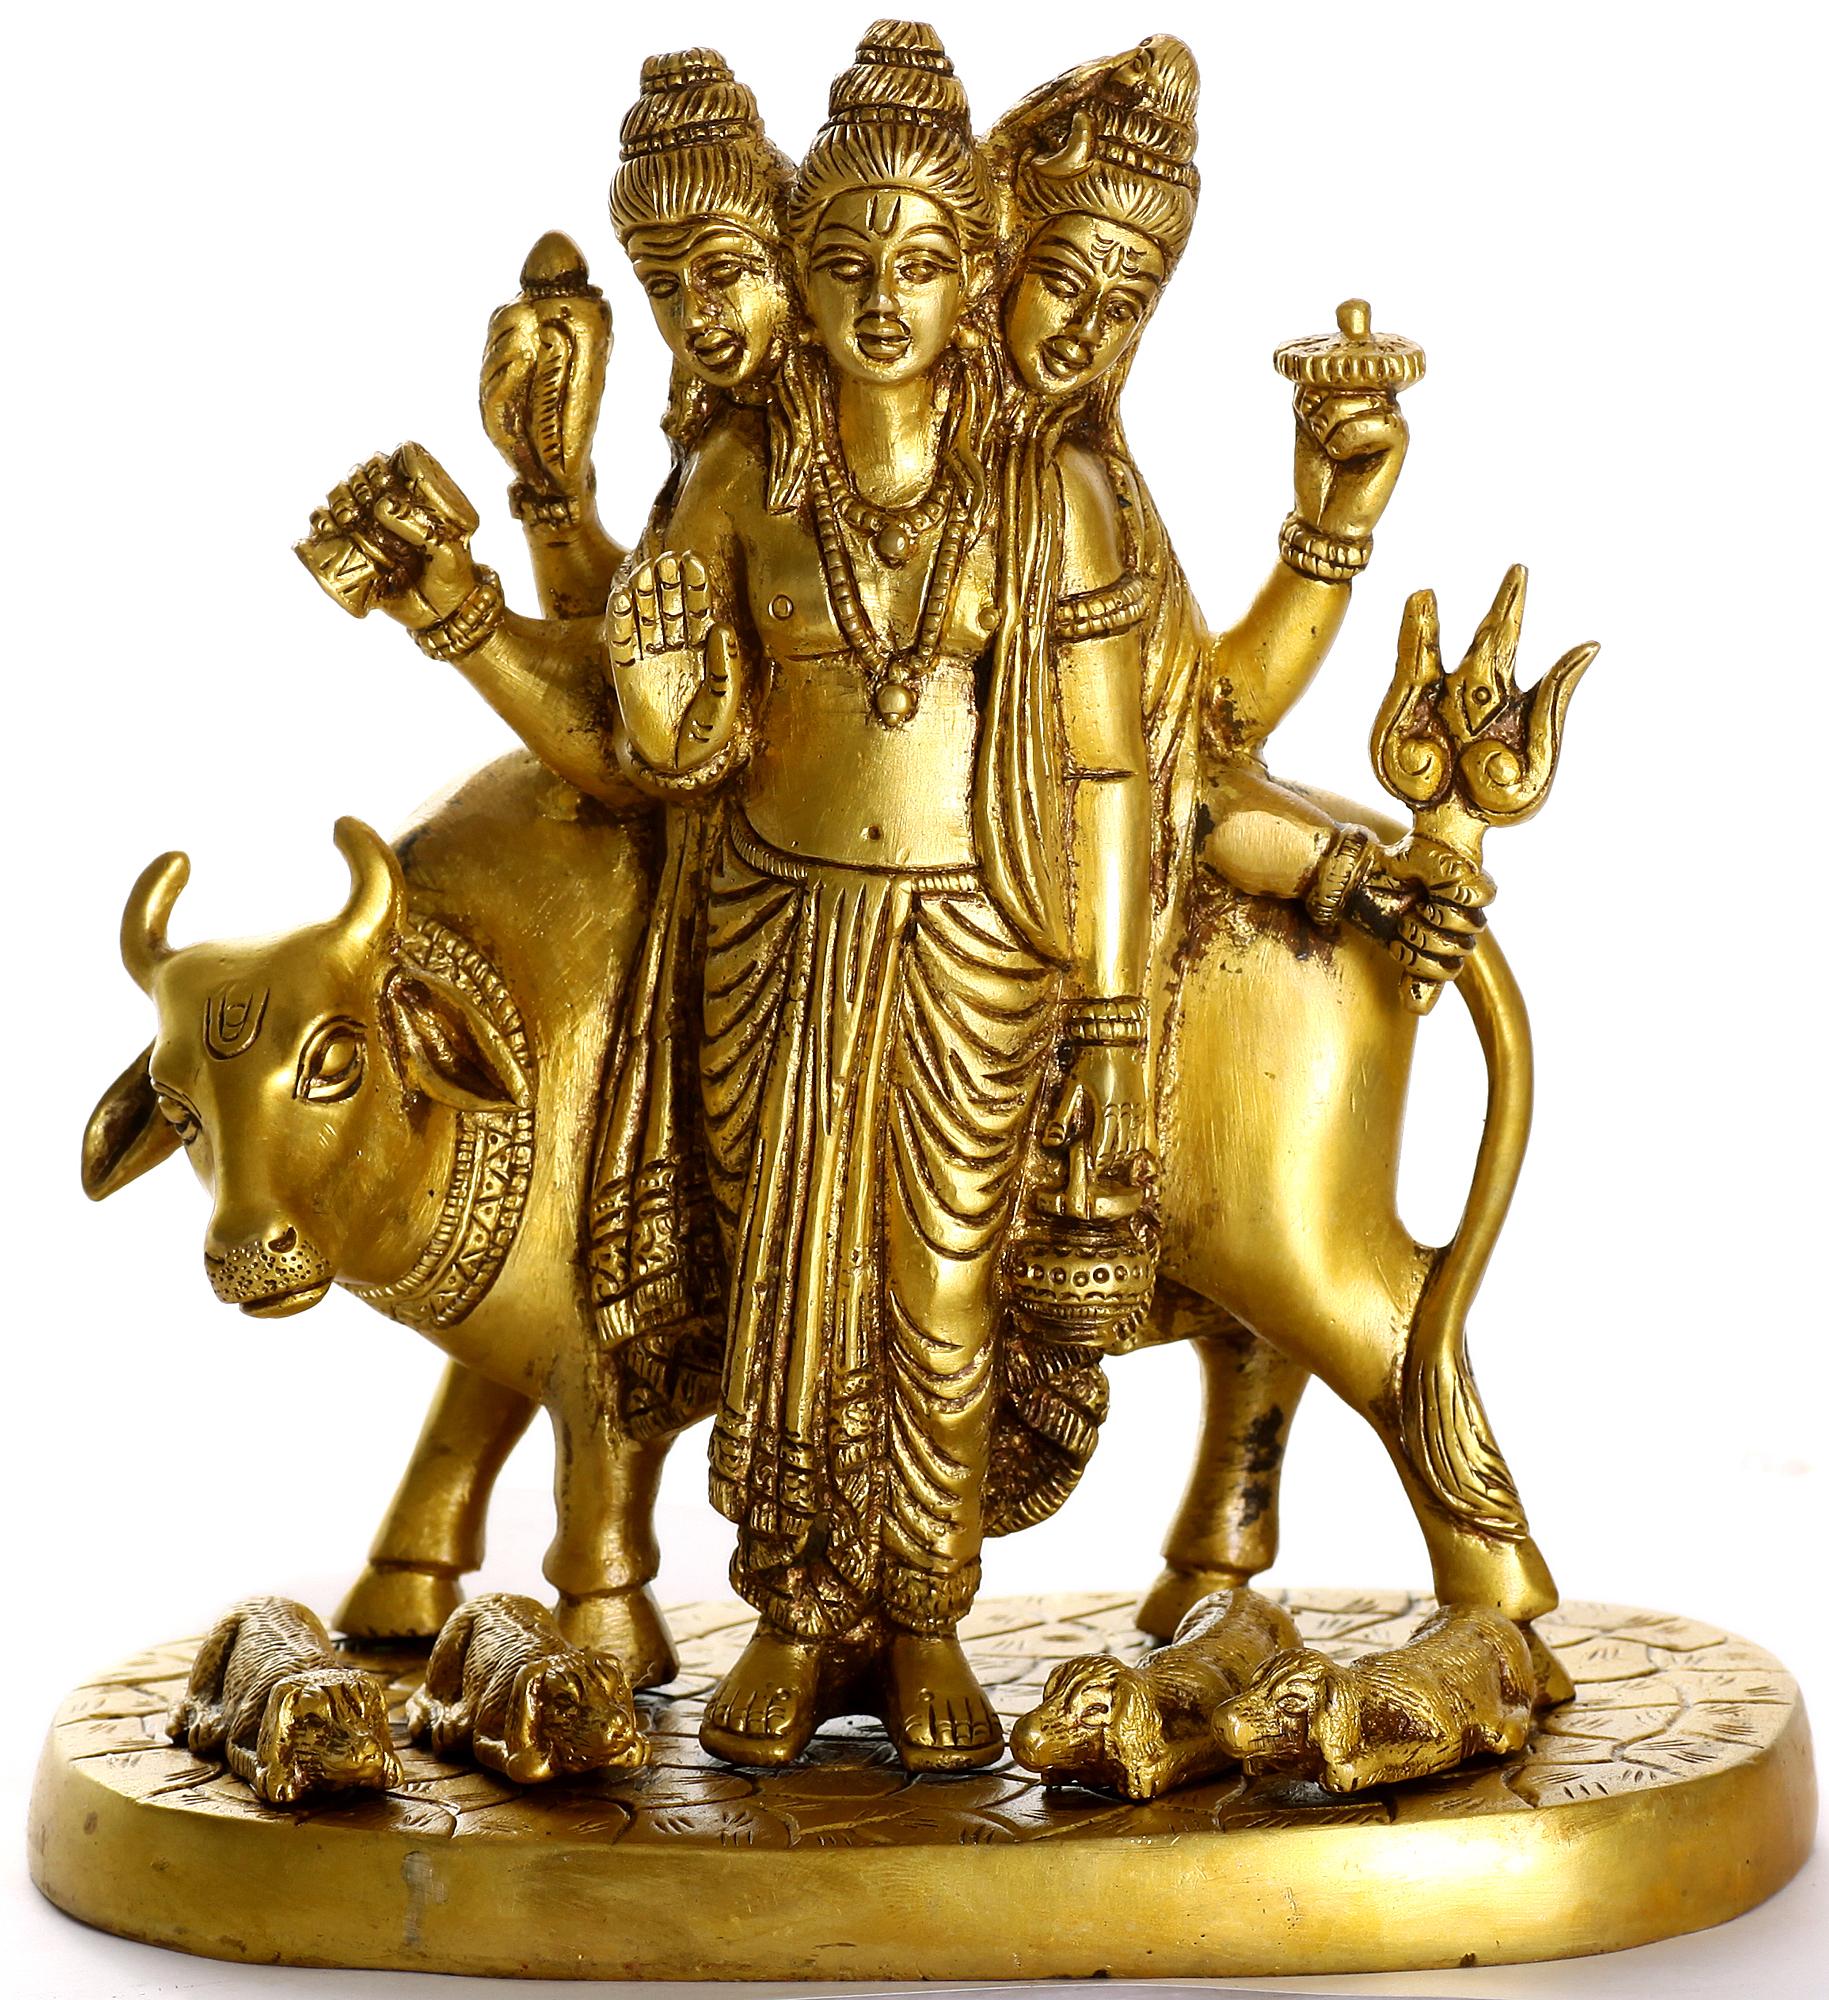 Lord Hanuman Hd Wallpaper The Holy Saint Dattatreya